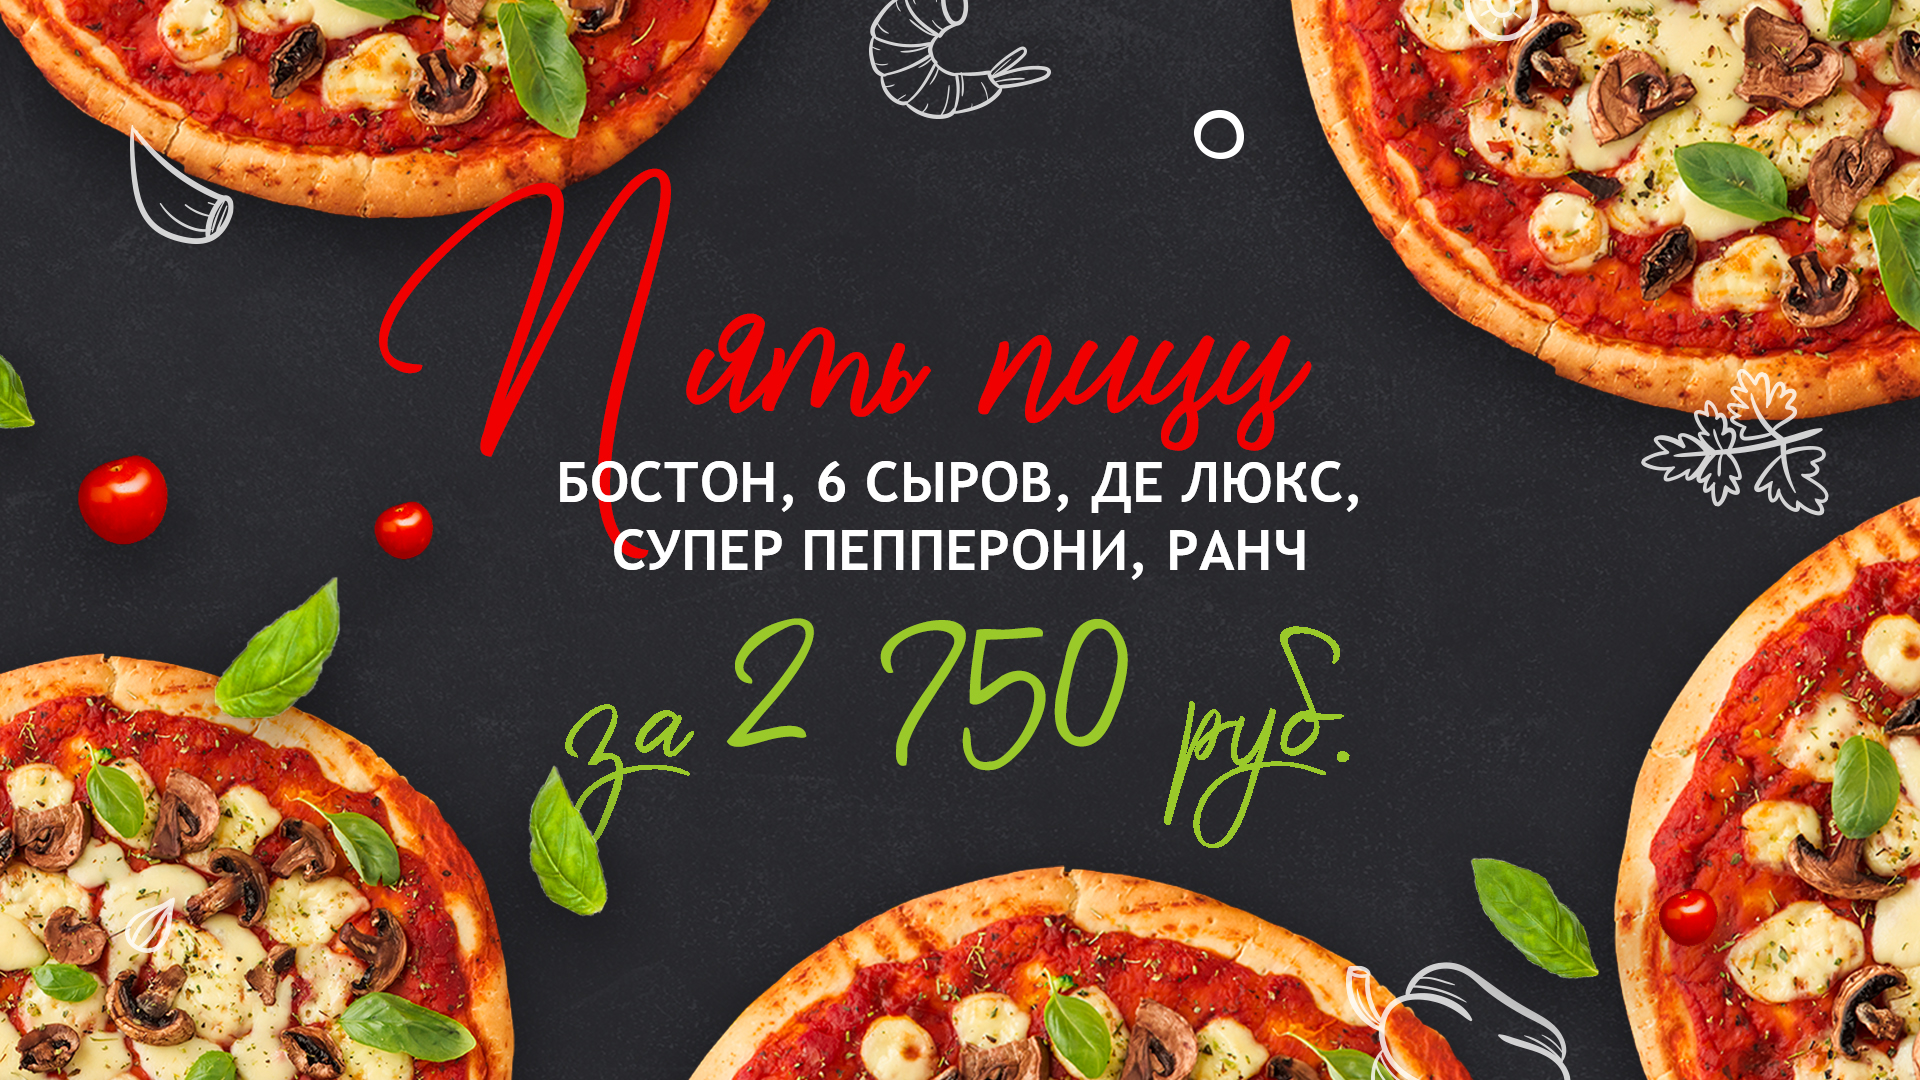 5 пицц за 2750 рублей